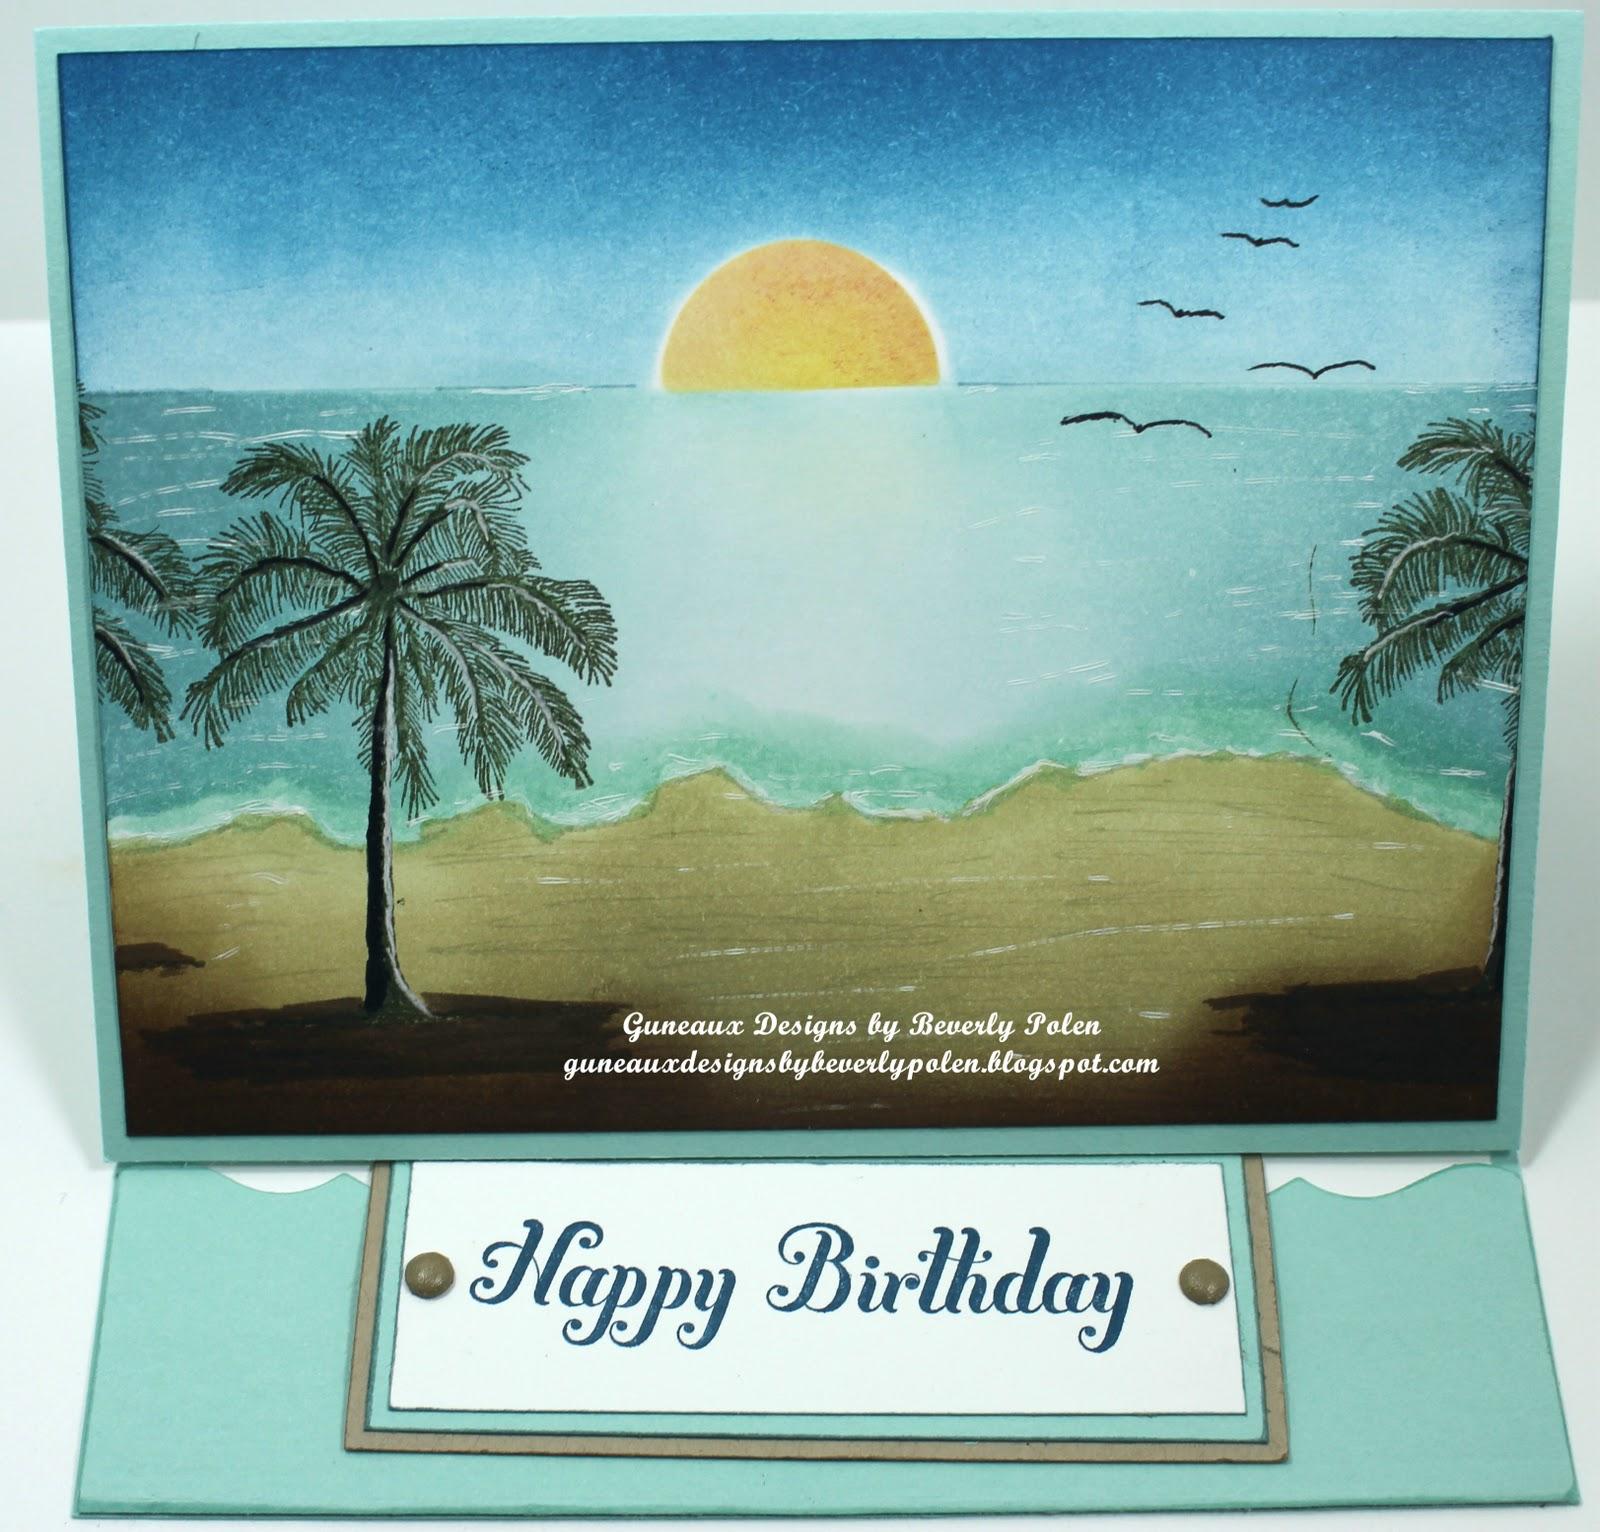 happy birthday beach scene Guneaux Designs by Beverly Polen: Brayered Beach Scene   Happy  happy birthday beach scene